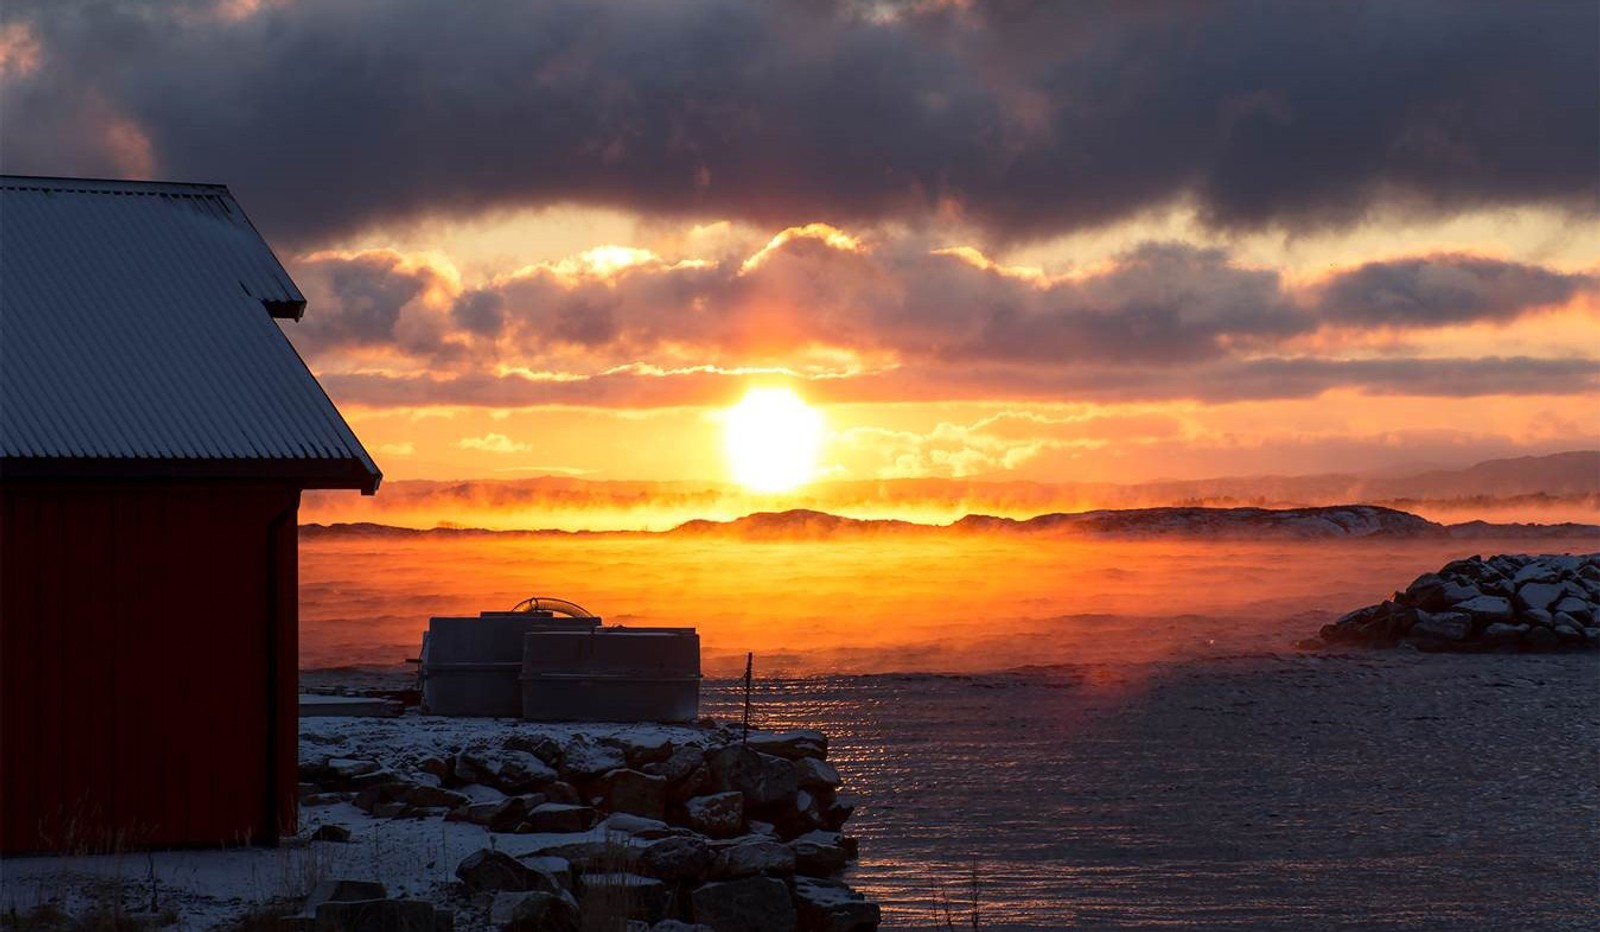 Soloppgang og frostrøyk, Hammarvika, Frøya